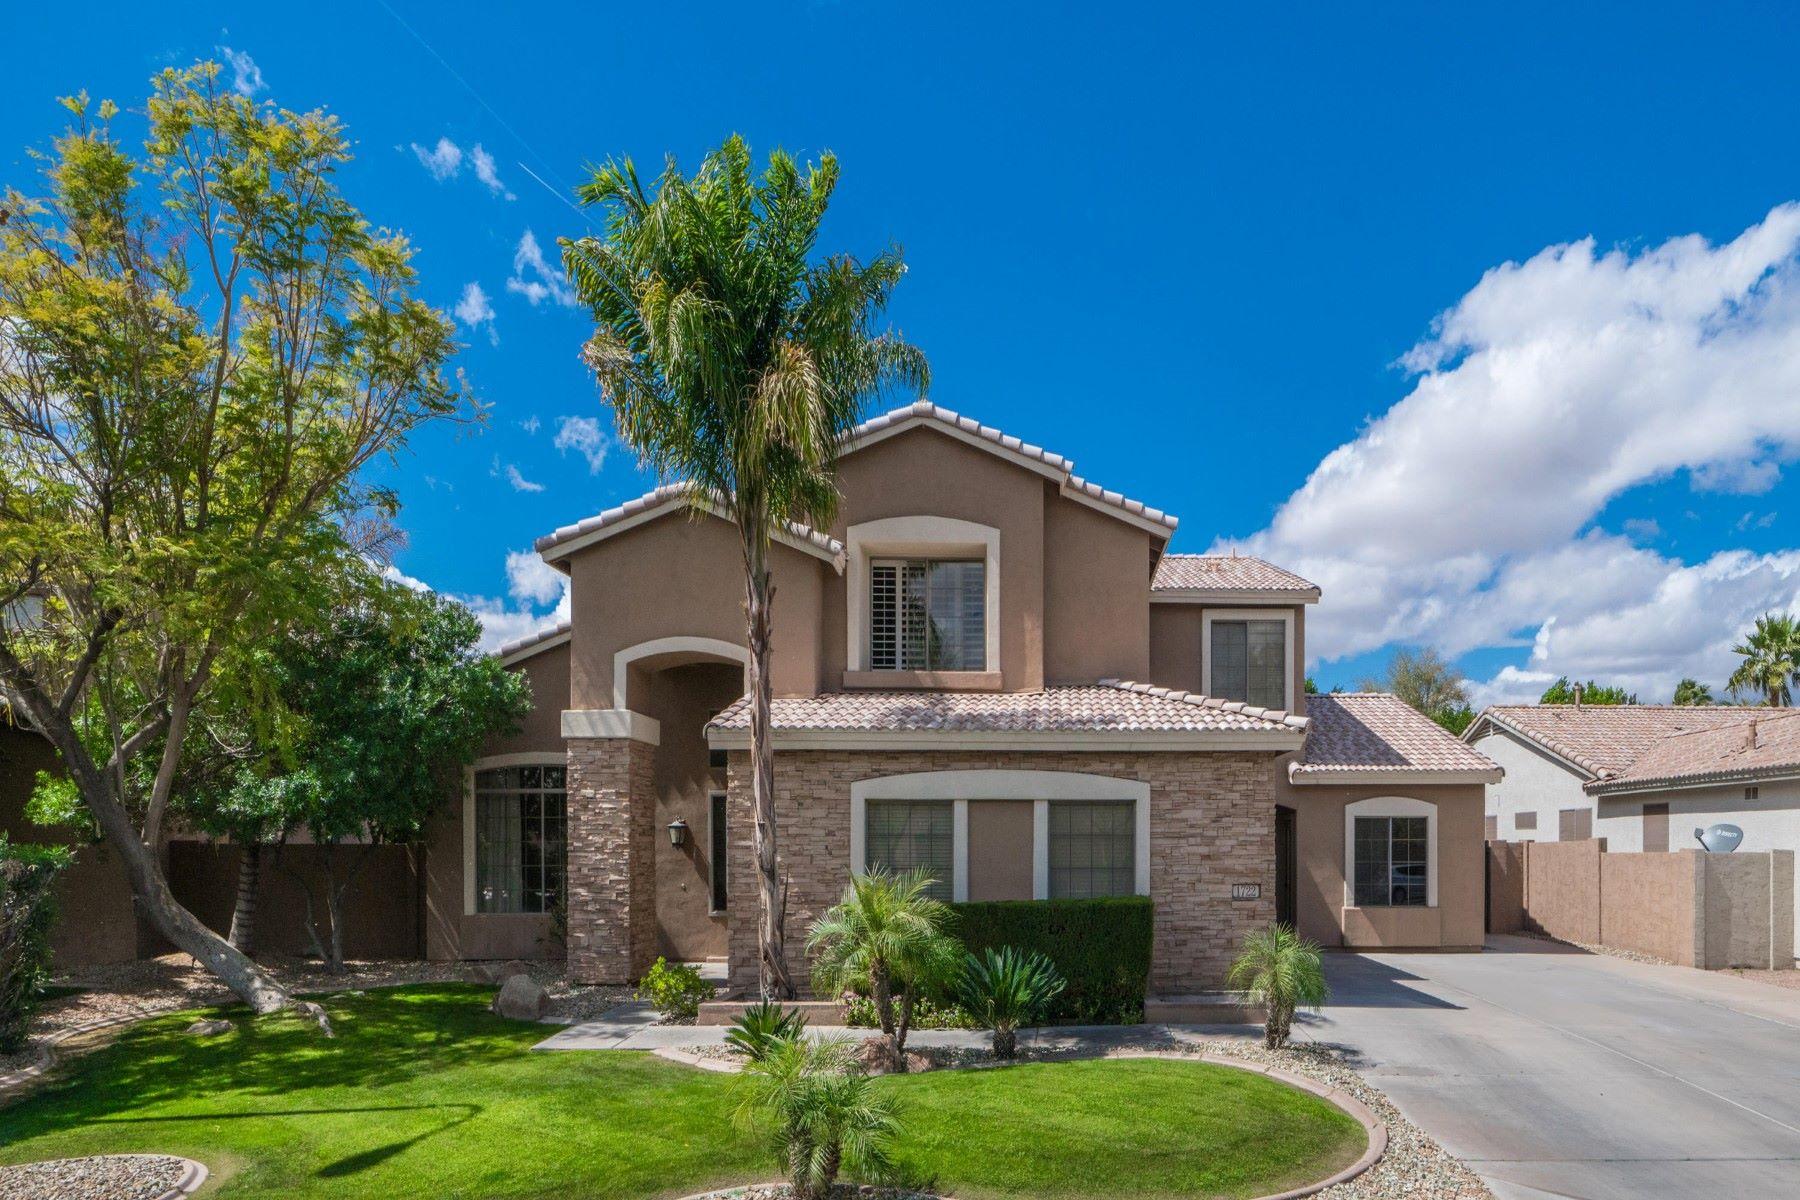 واحد منزل الأسرة للـ Sale في Gorgeous Family Chandler Home 1722 S Los Altos Dr Chandler, Arizona 85286 United States